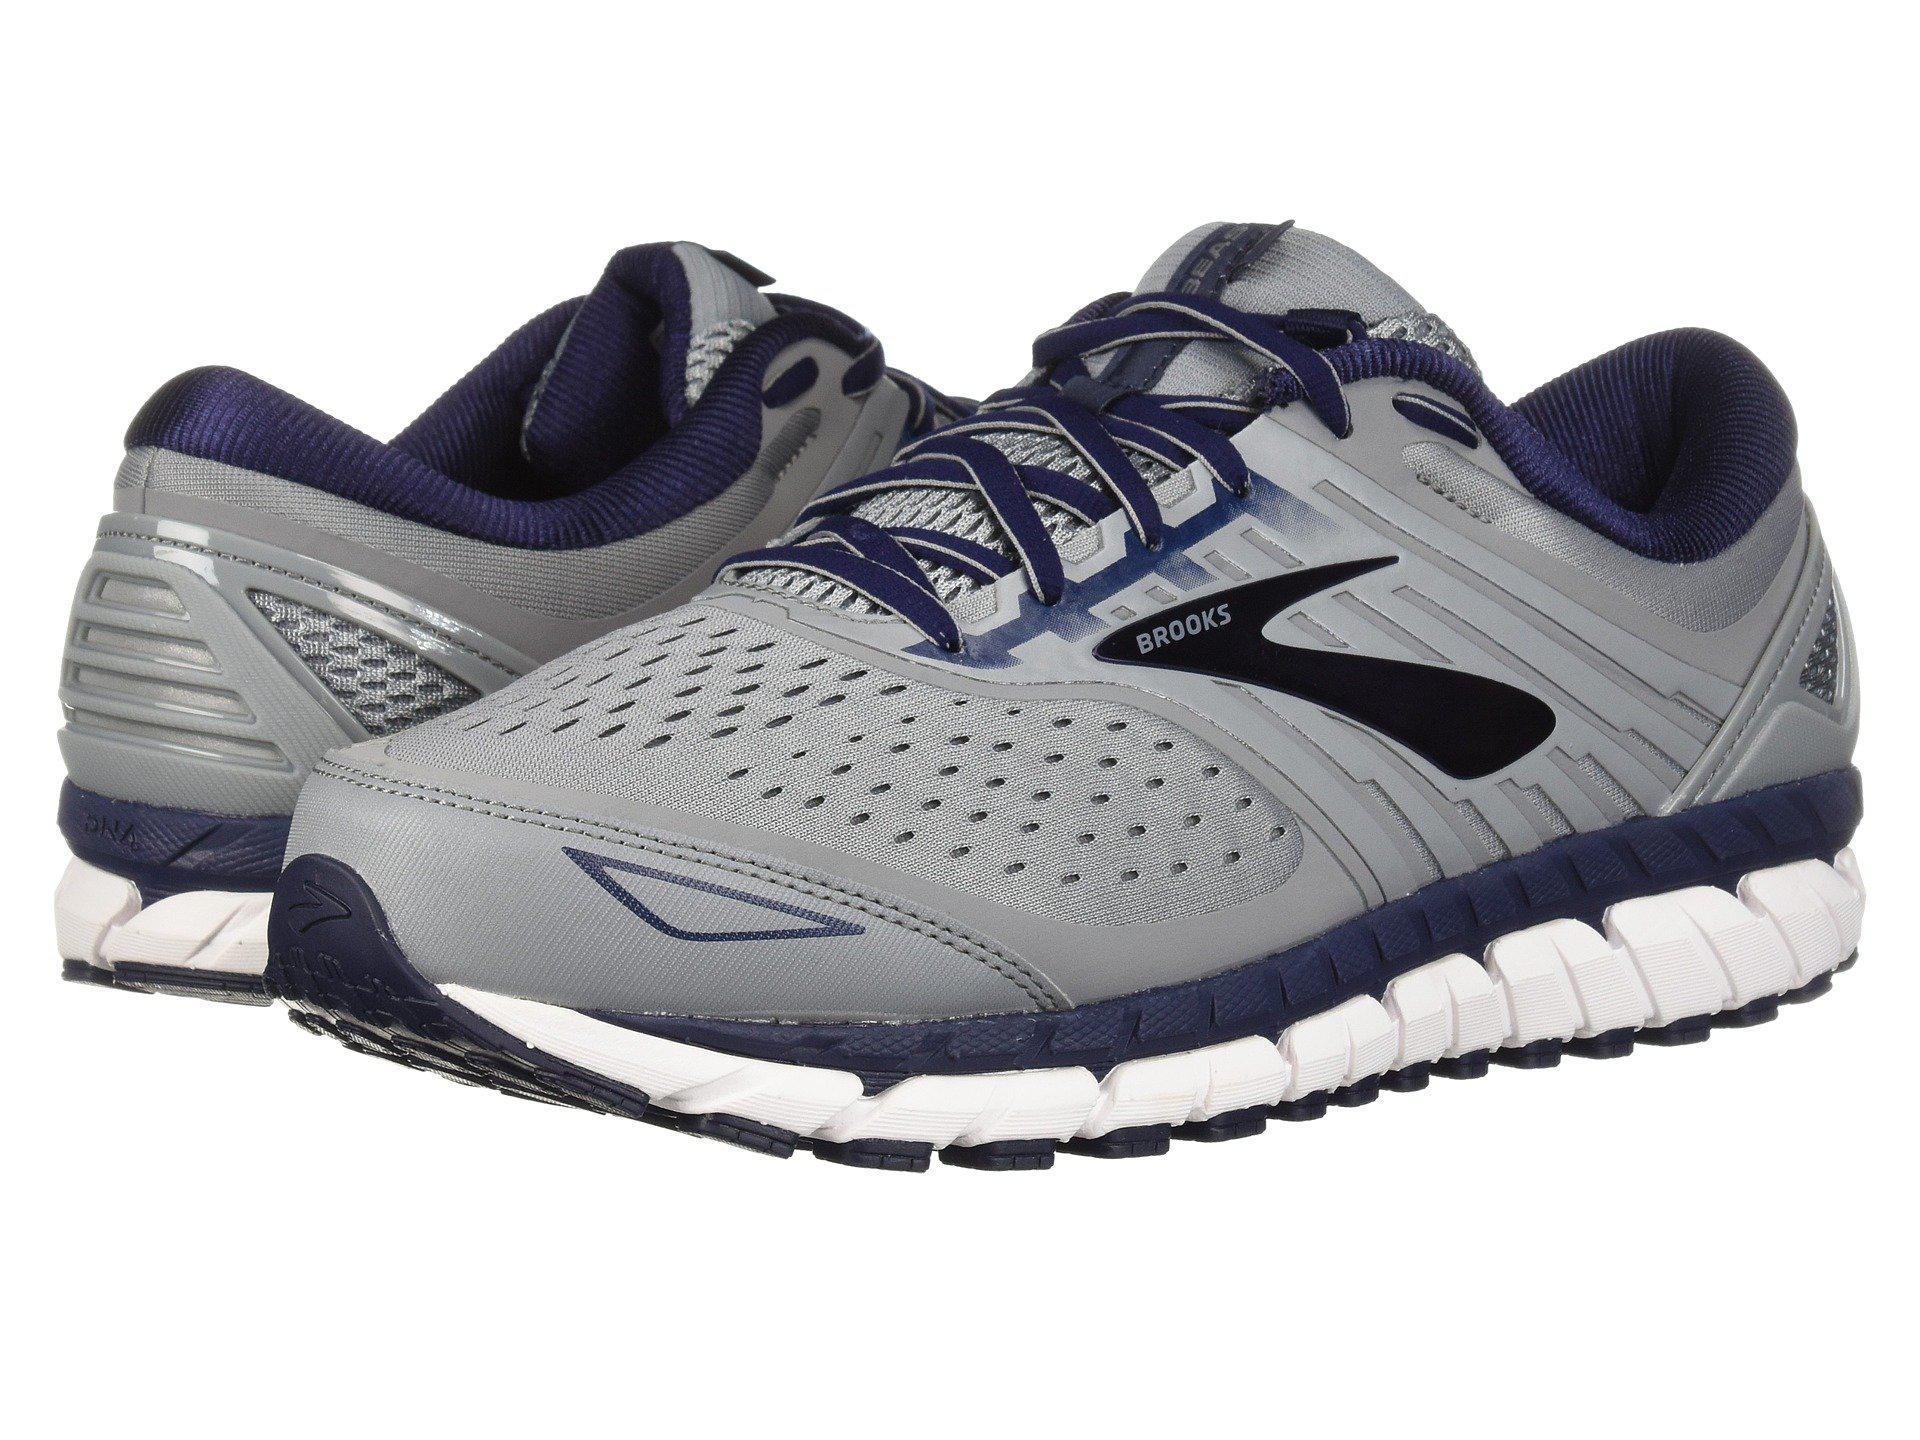 a92394eace944 Lyst brooks beast black grey silver mens running shoes jpg 1920x1440 Brooks  tennis shoe white